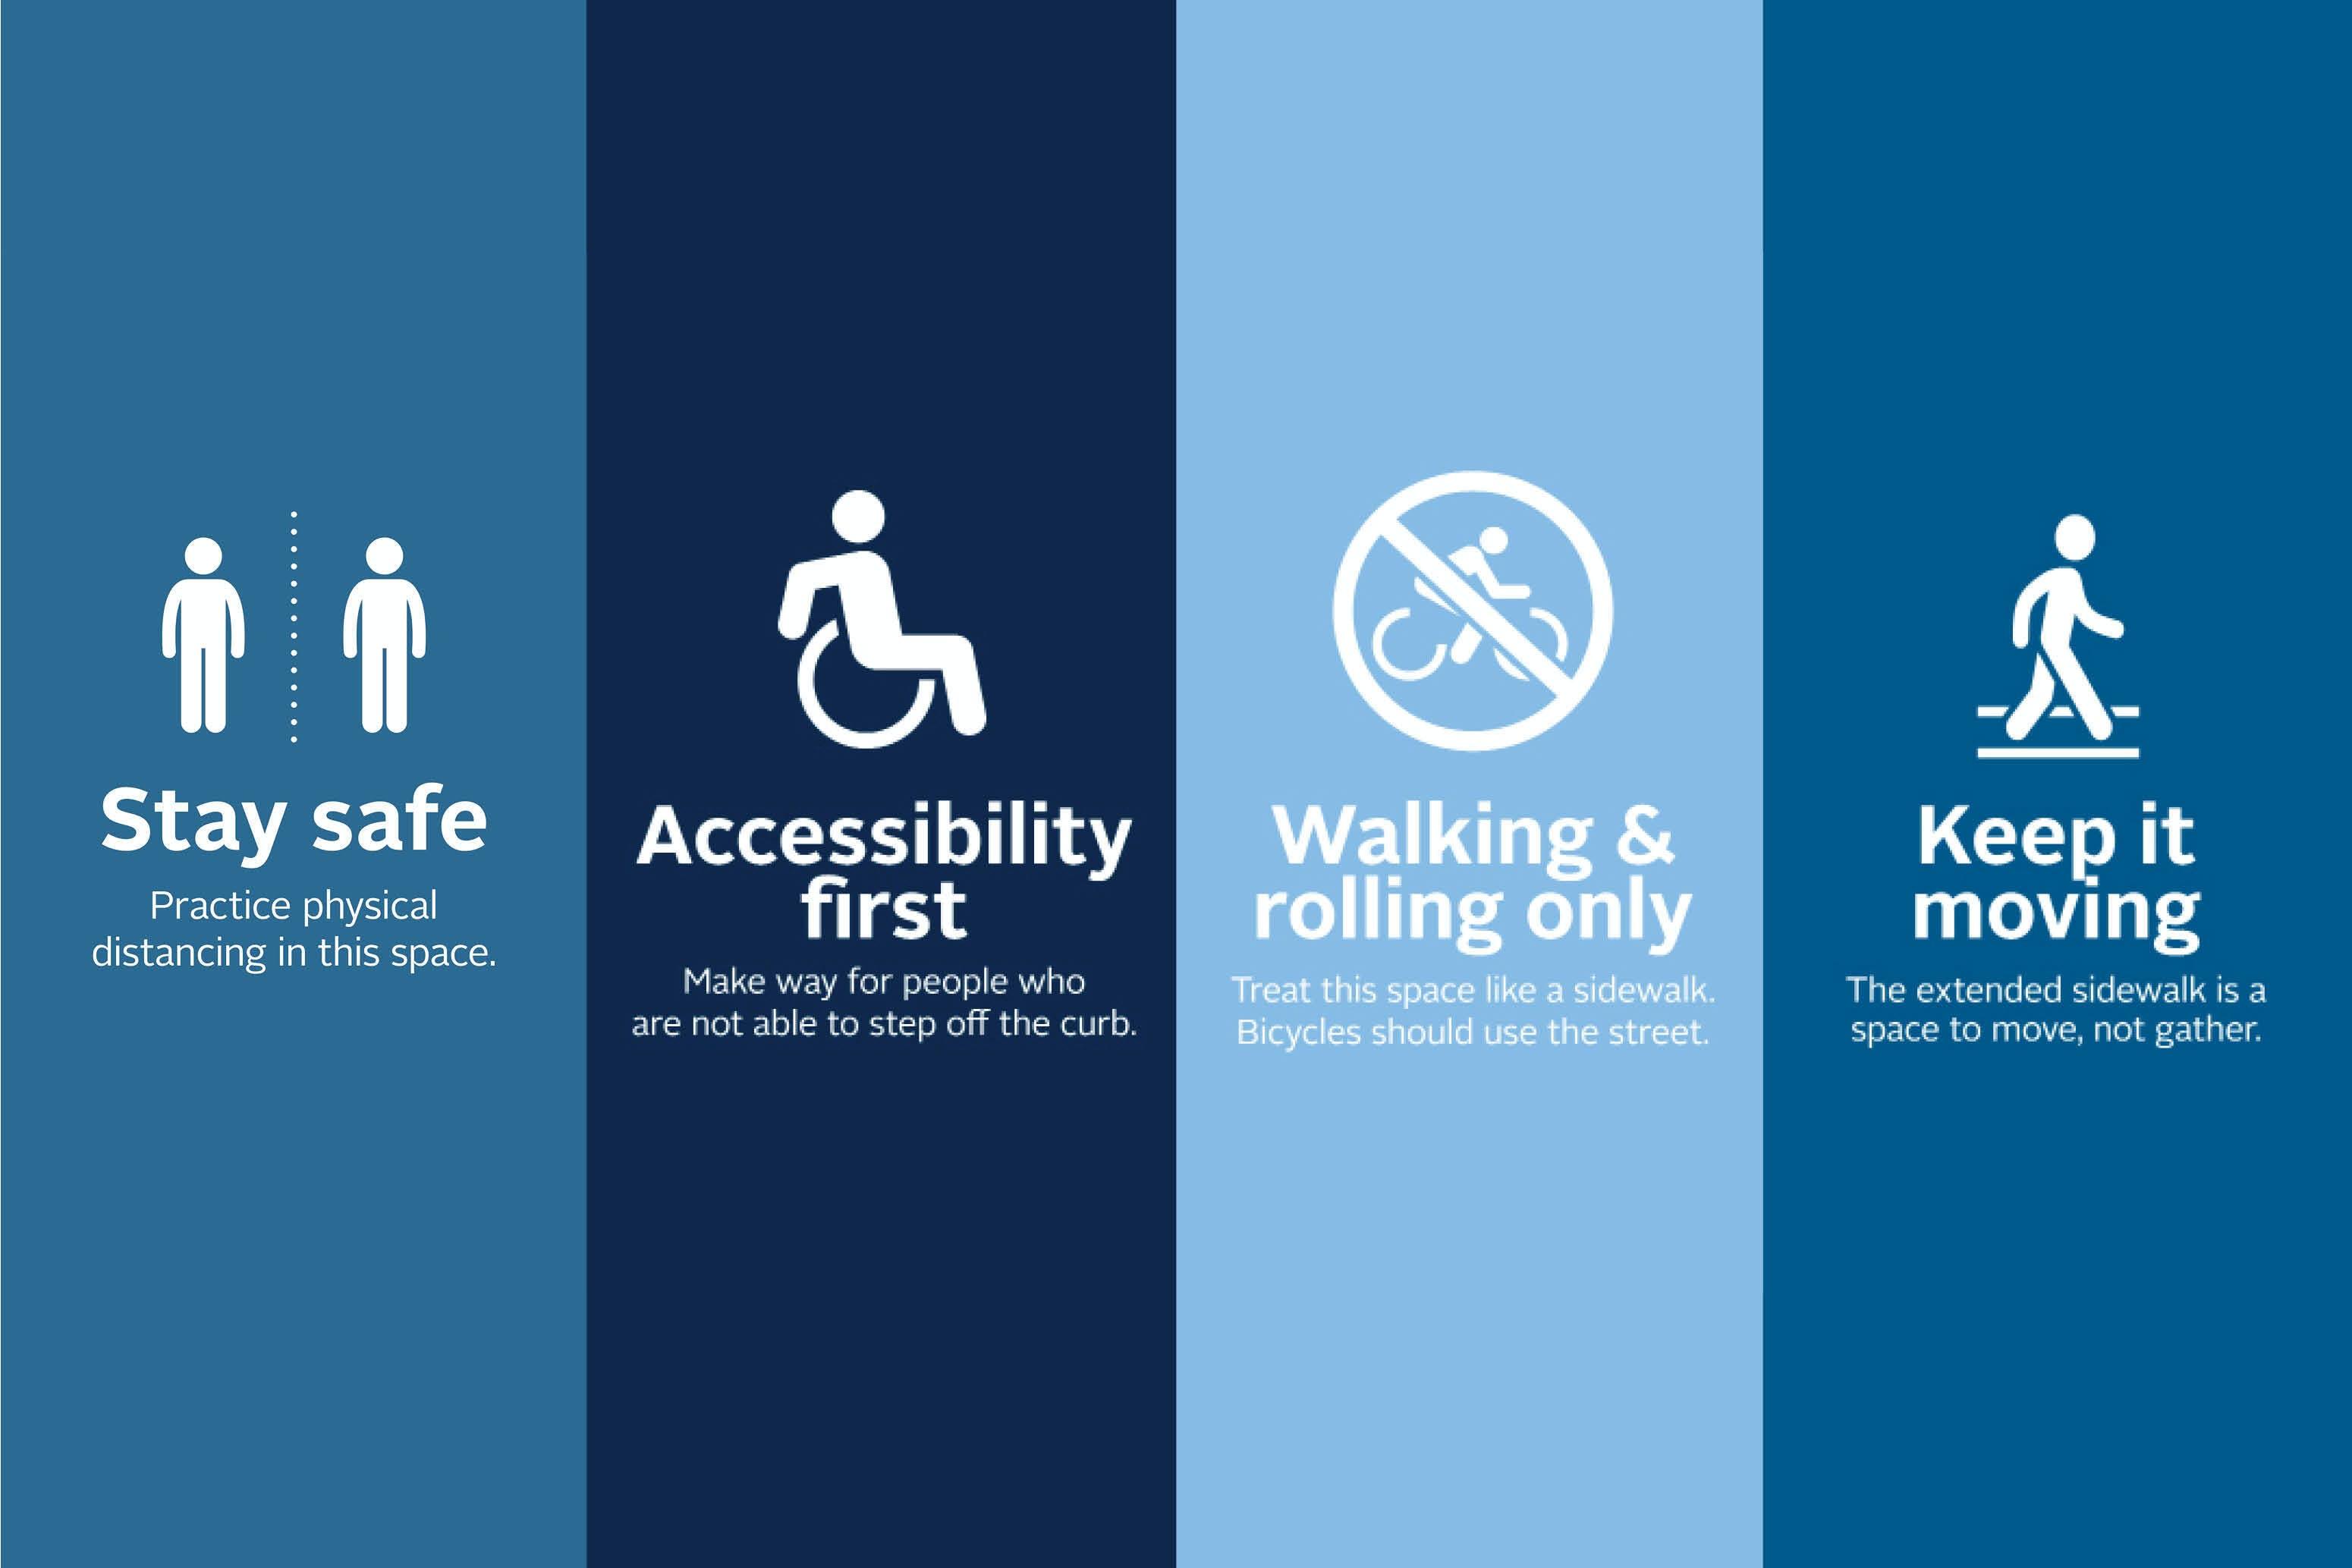 Safe spaces signage